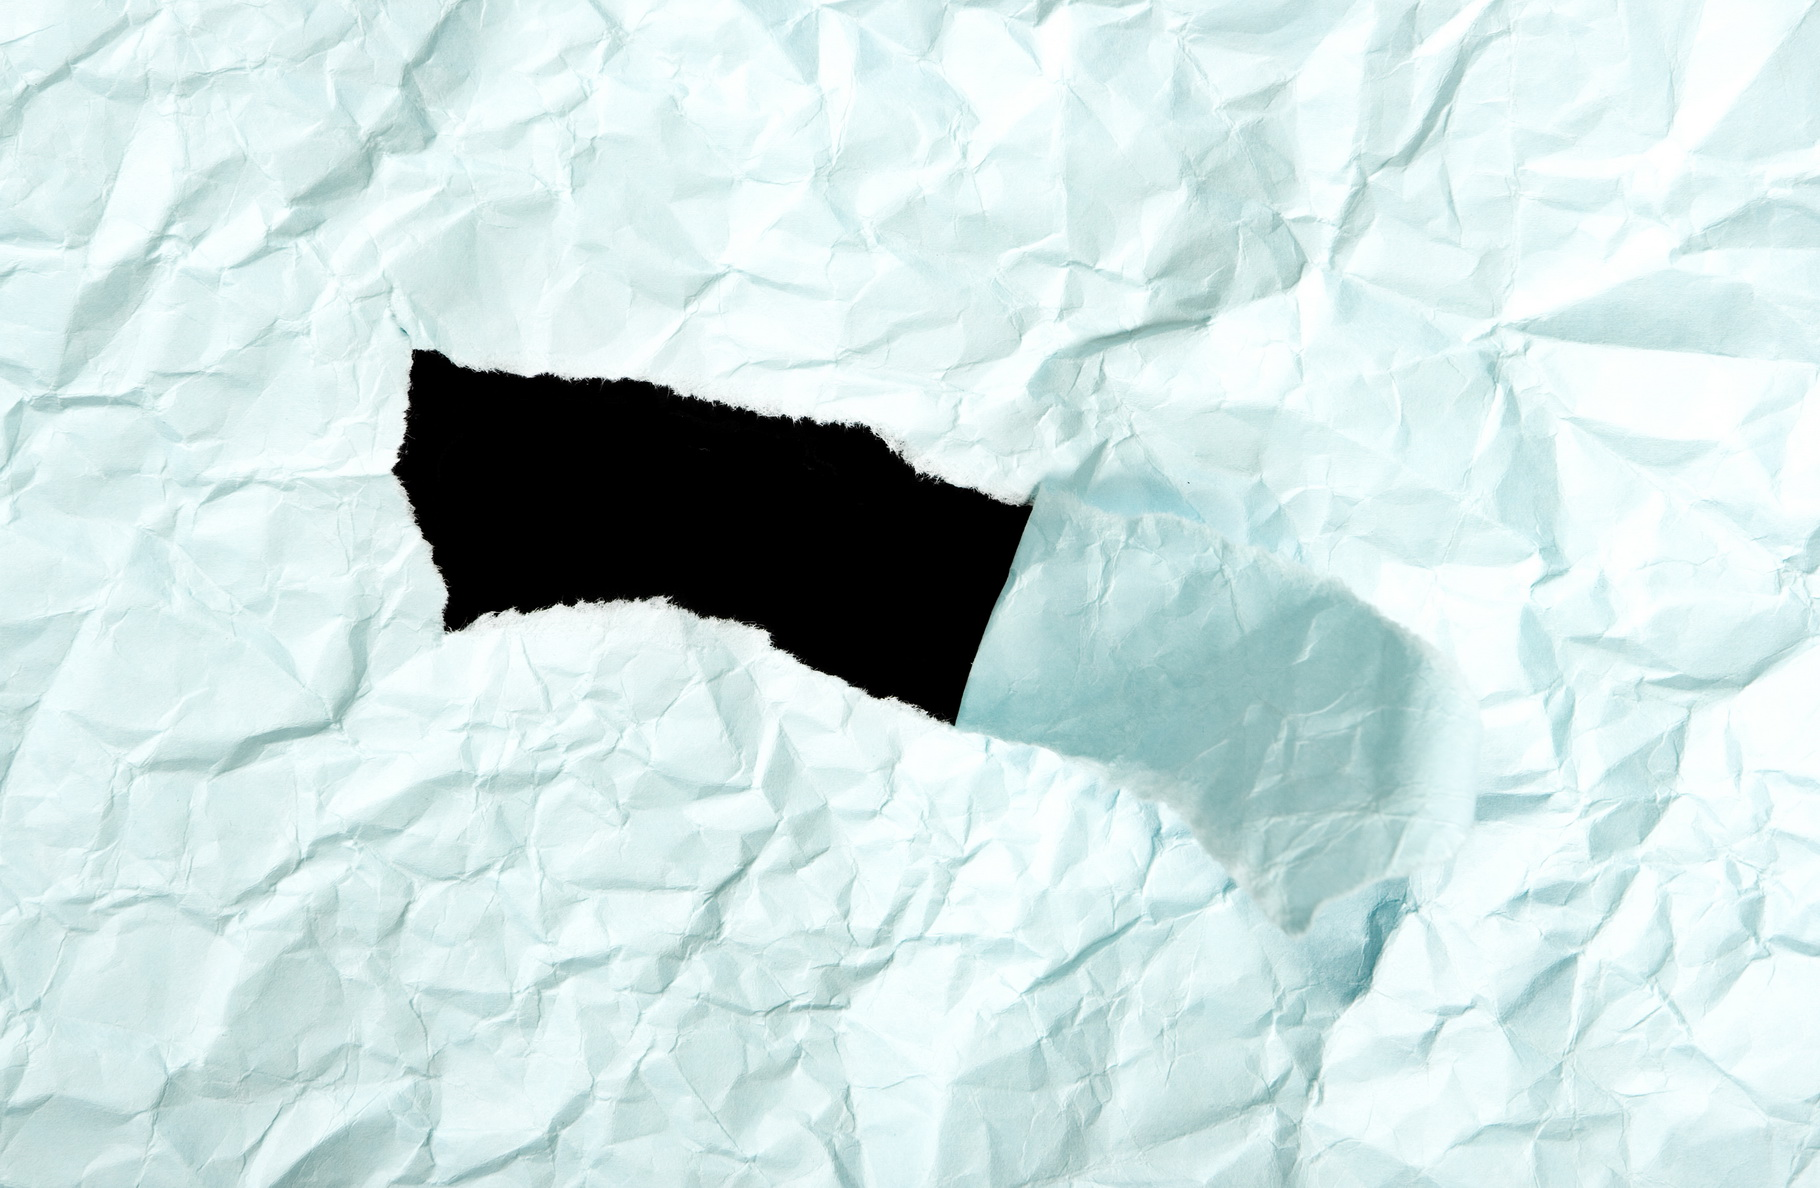 crumpled paper, Trash, Texture, Sphere, Sparse, HQ Photo